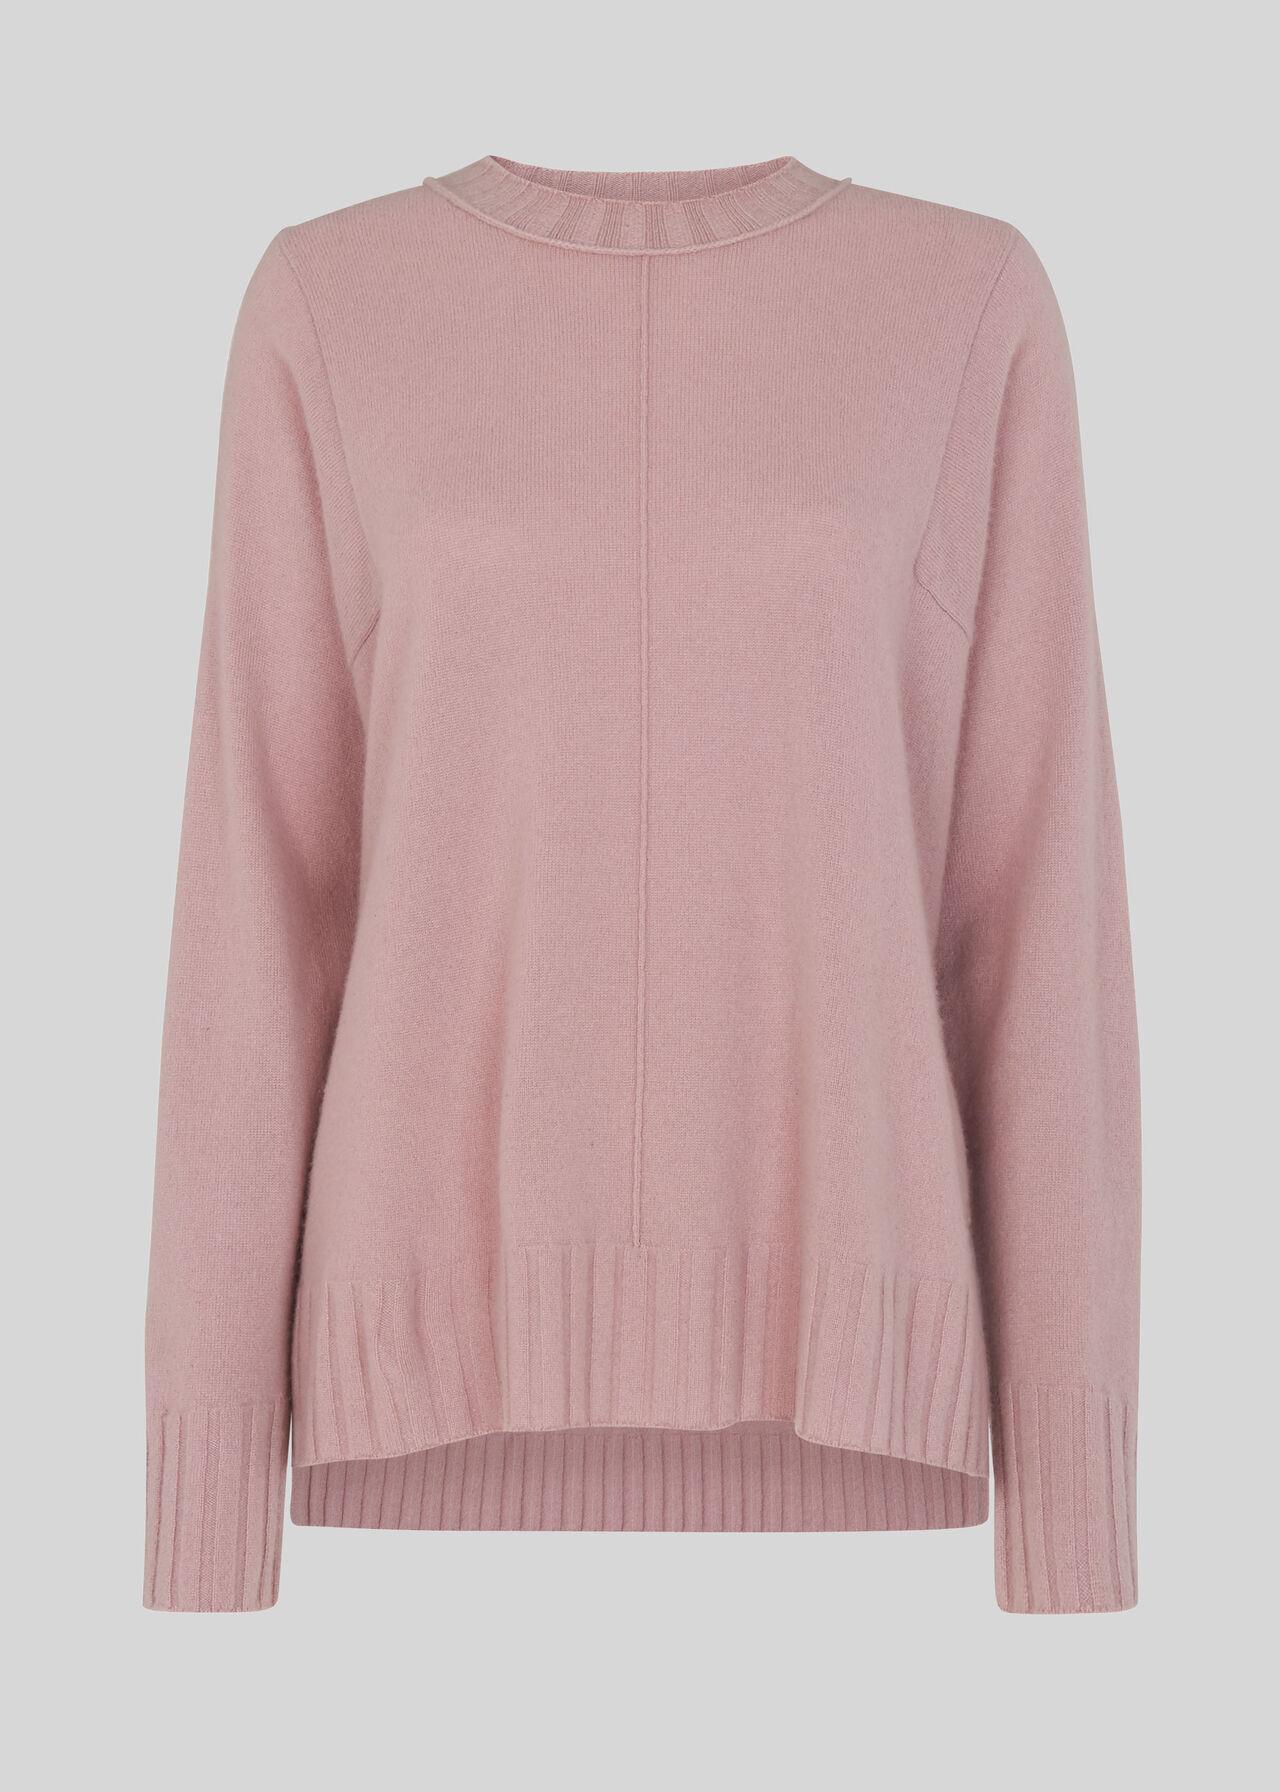 Cashmere Crew Neck Sweater Pink